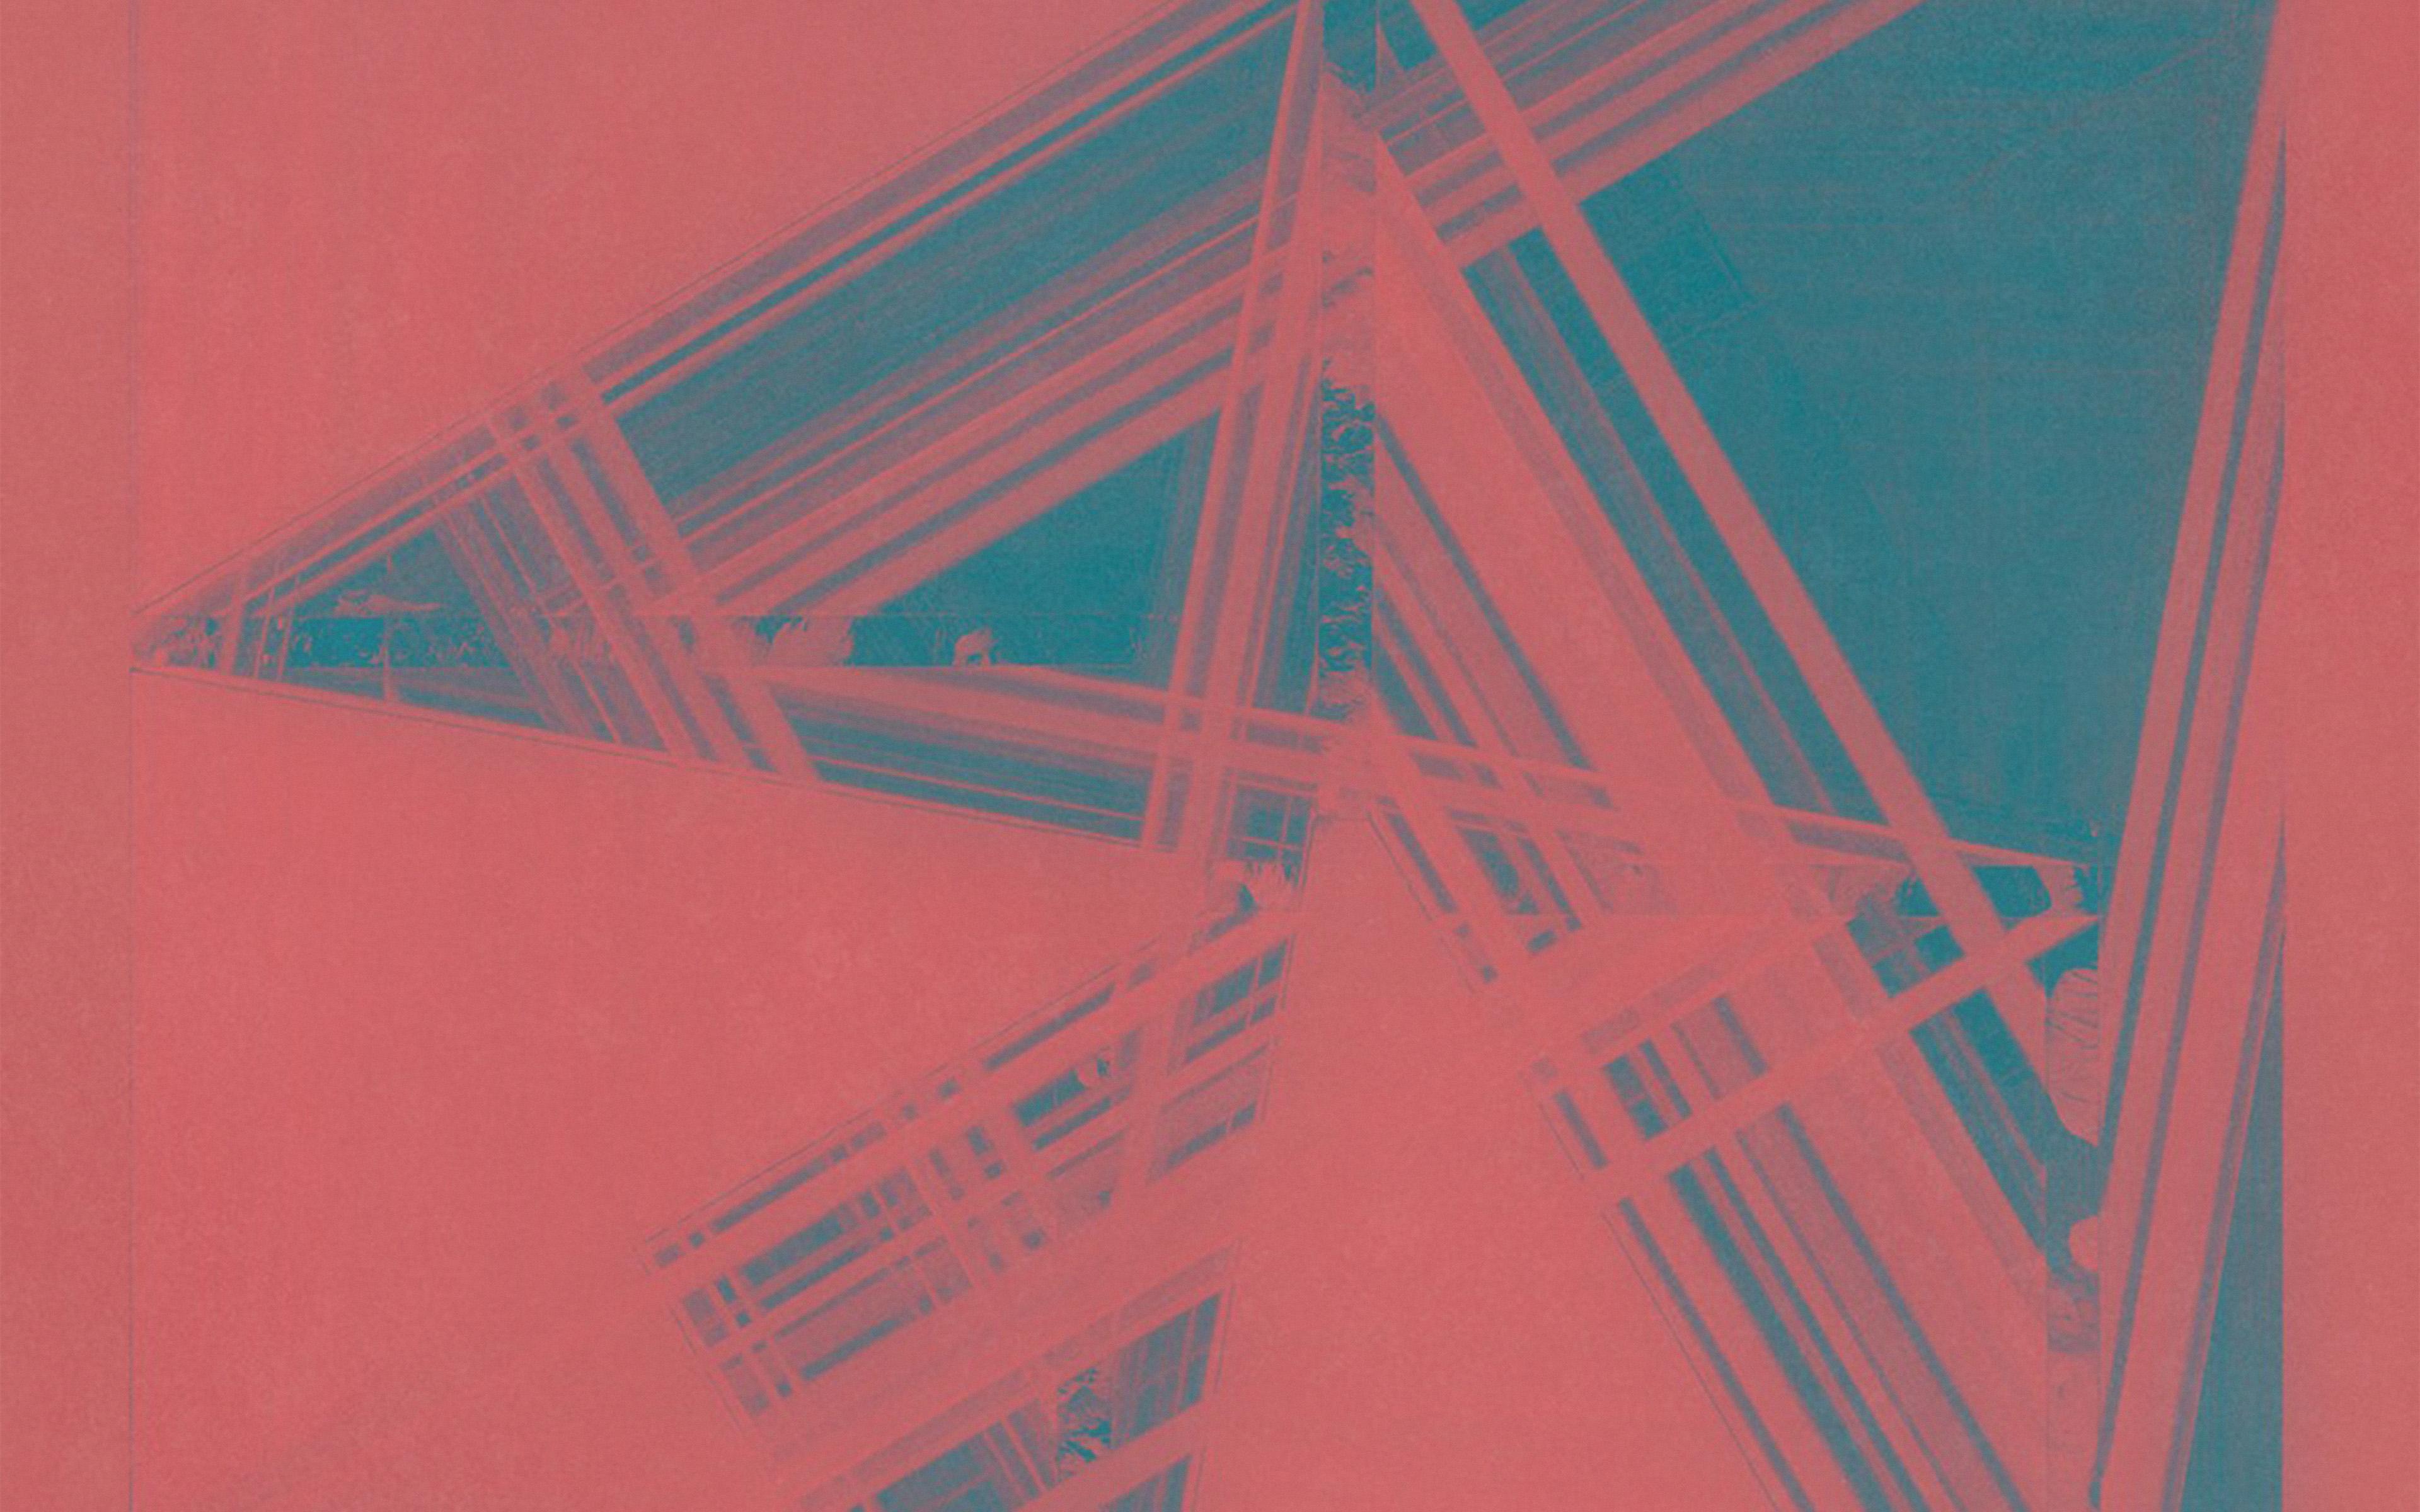 Au05 Music Cover Art Blue Pink Death Cab For Cutie Illustration